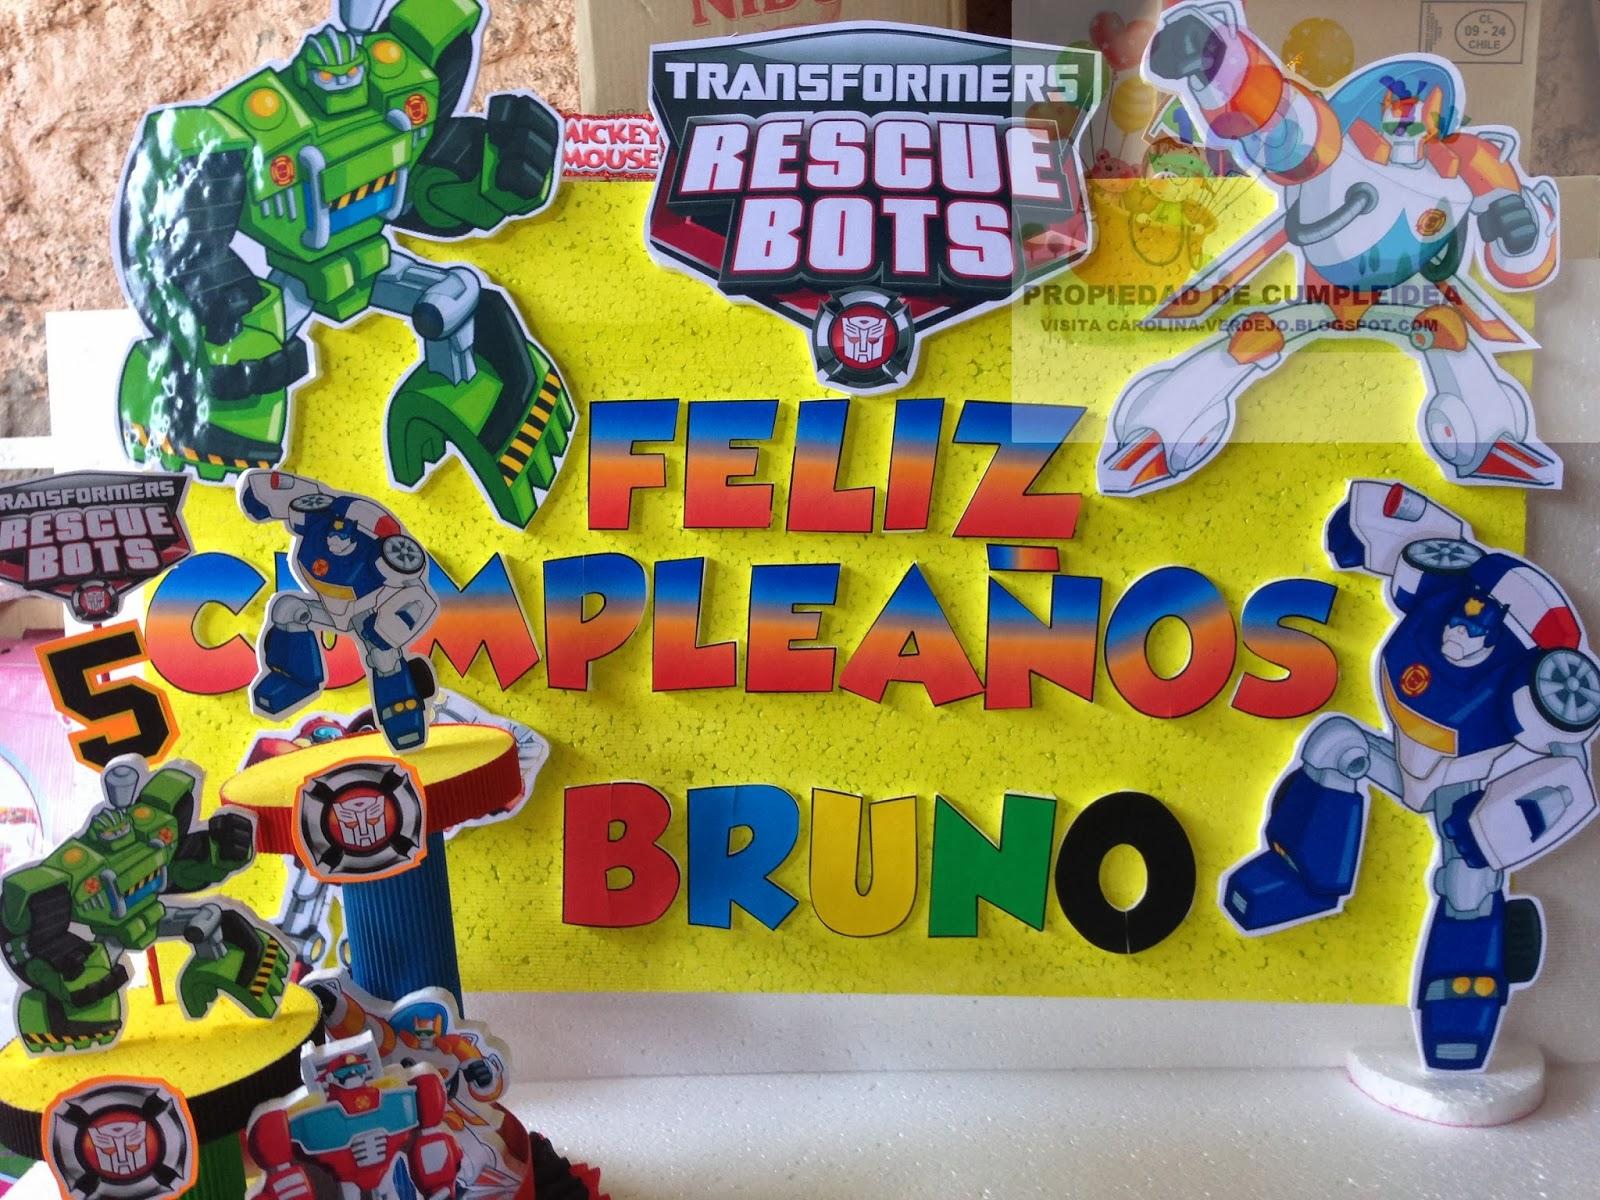 Decoraciones infantiles rescue bot - Decoraciones para cumpleanos infantiles ...